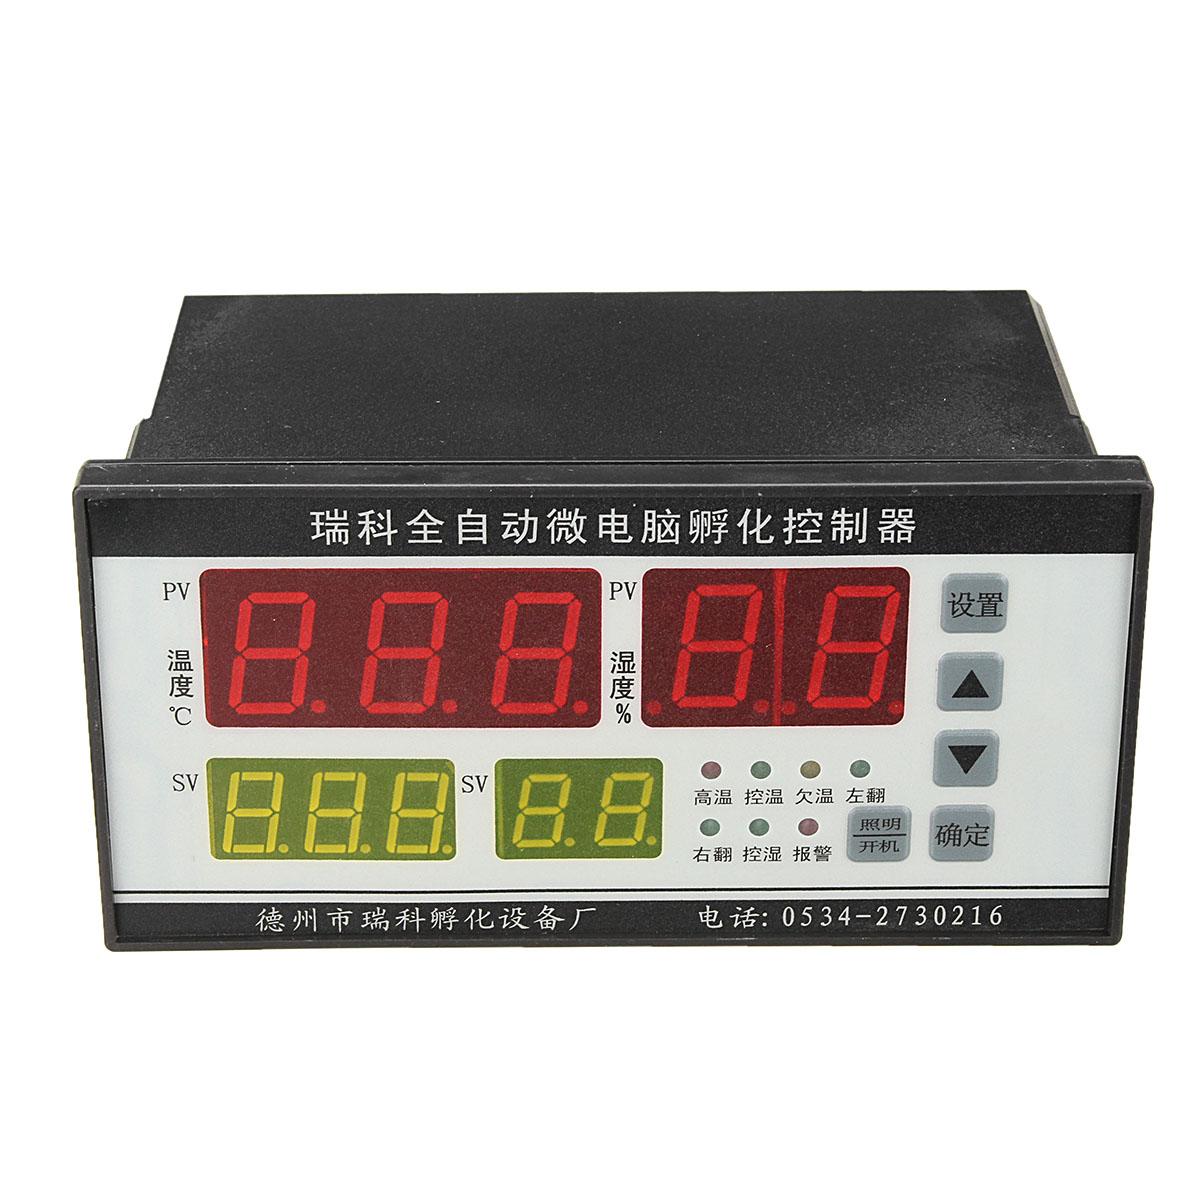 Digital Automatic Computer Incubator Controller Temperature Humidity Controller Industrial Incubator